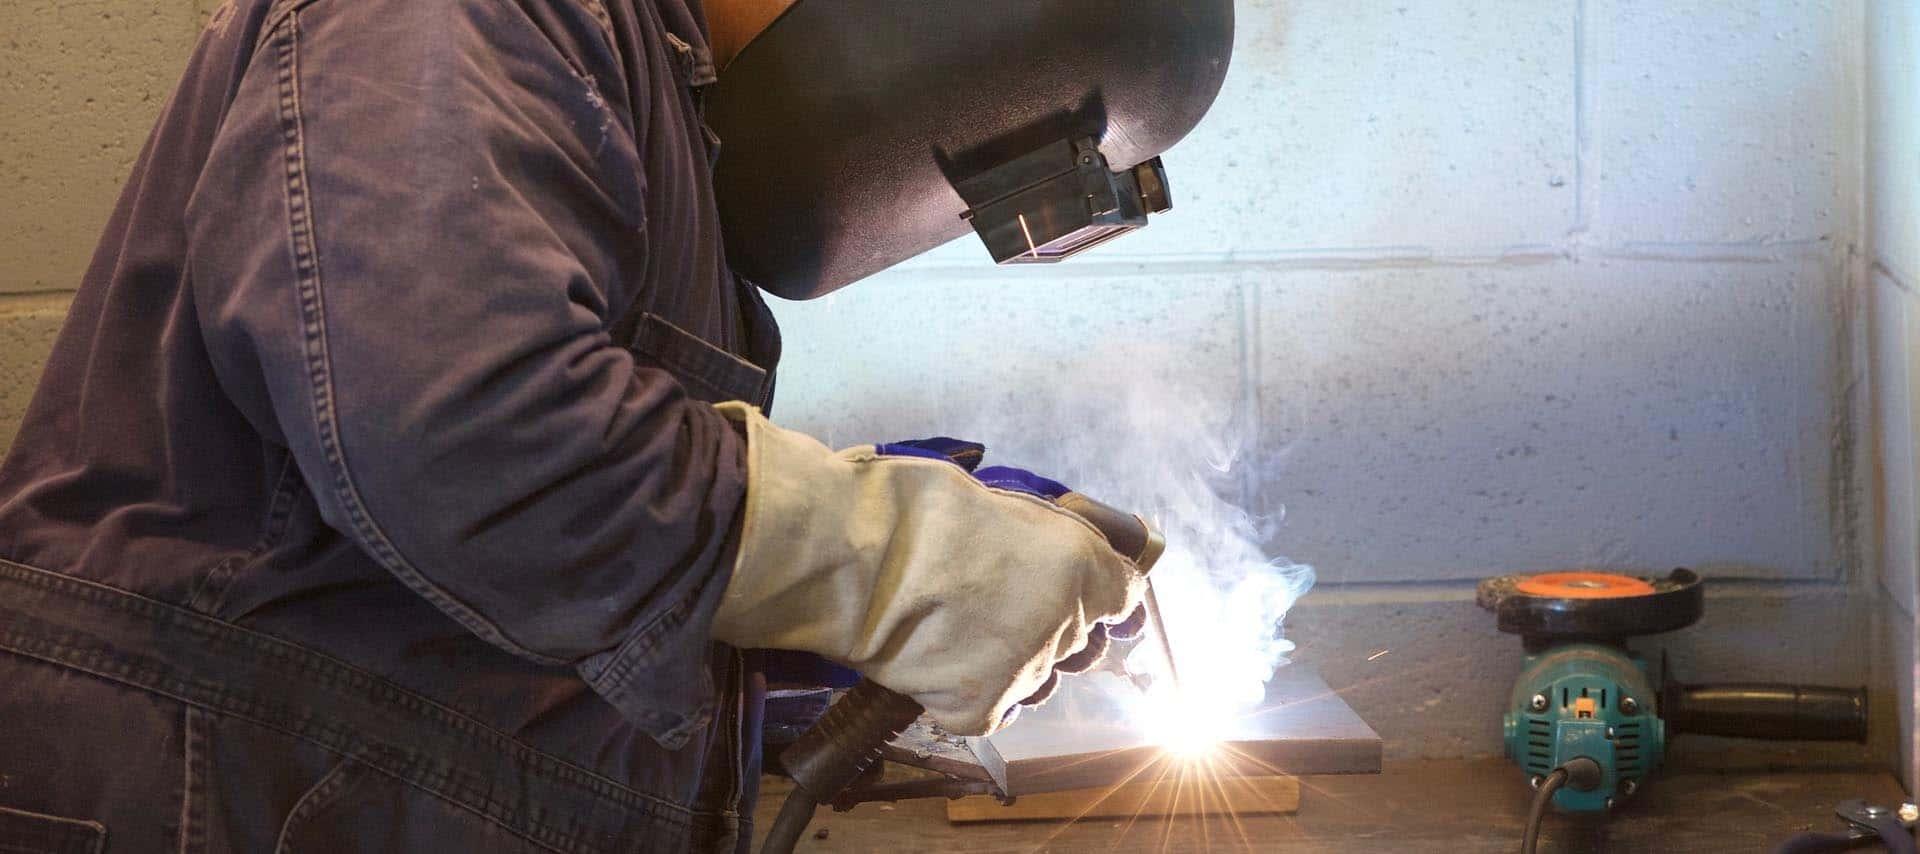 image of a worker welding in his garage